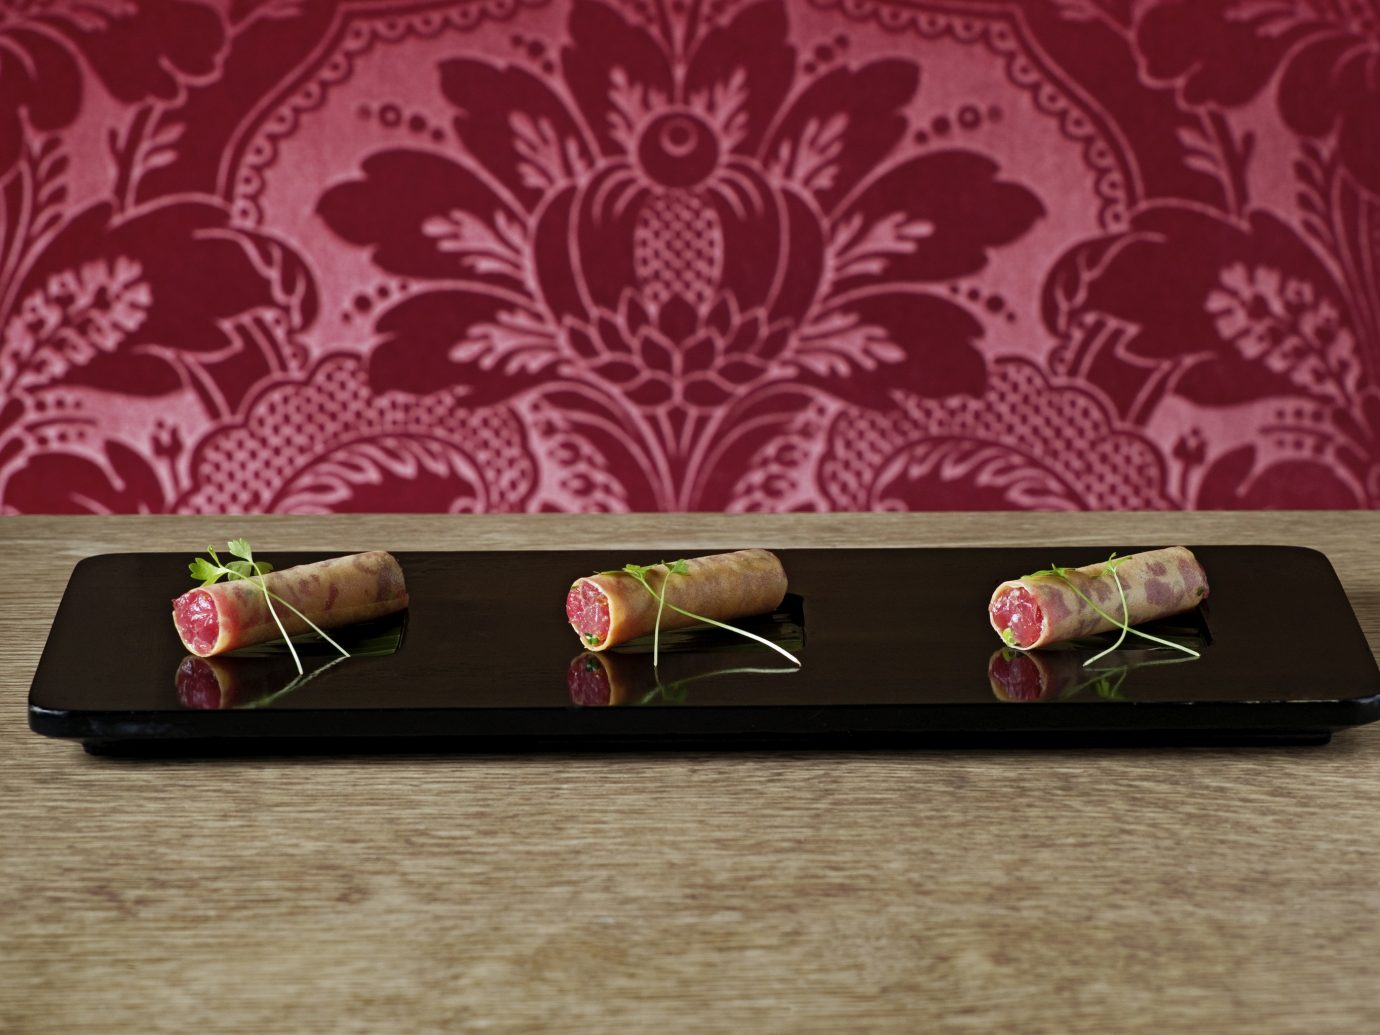 Food + Drink indoor pink Design pattern wallpaper